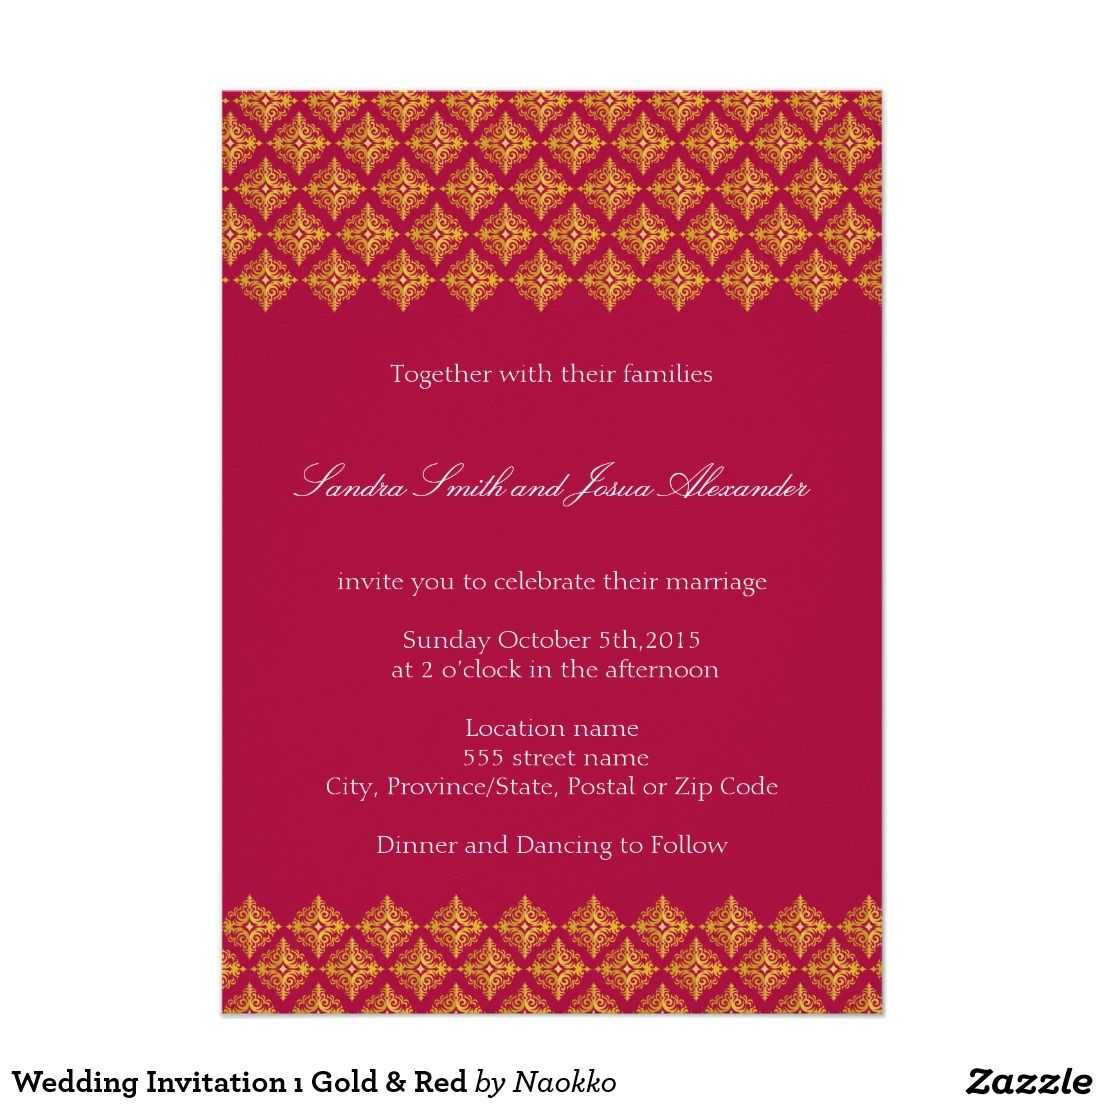 Wedding Invitation ı Gold & Red | Other Wedding Stuff (invitations ...